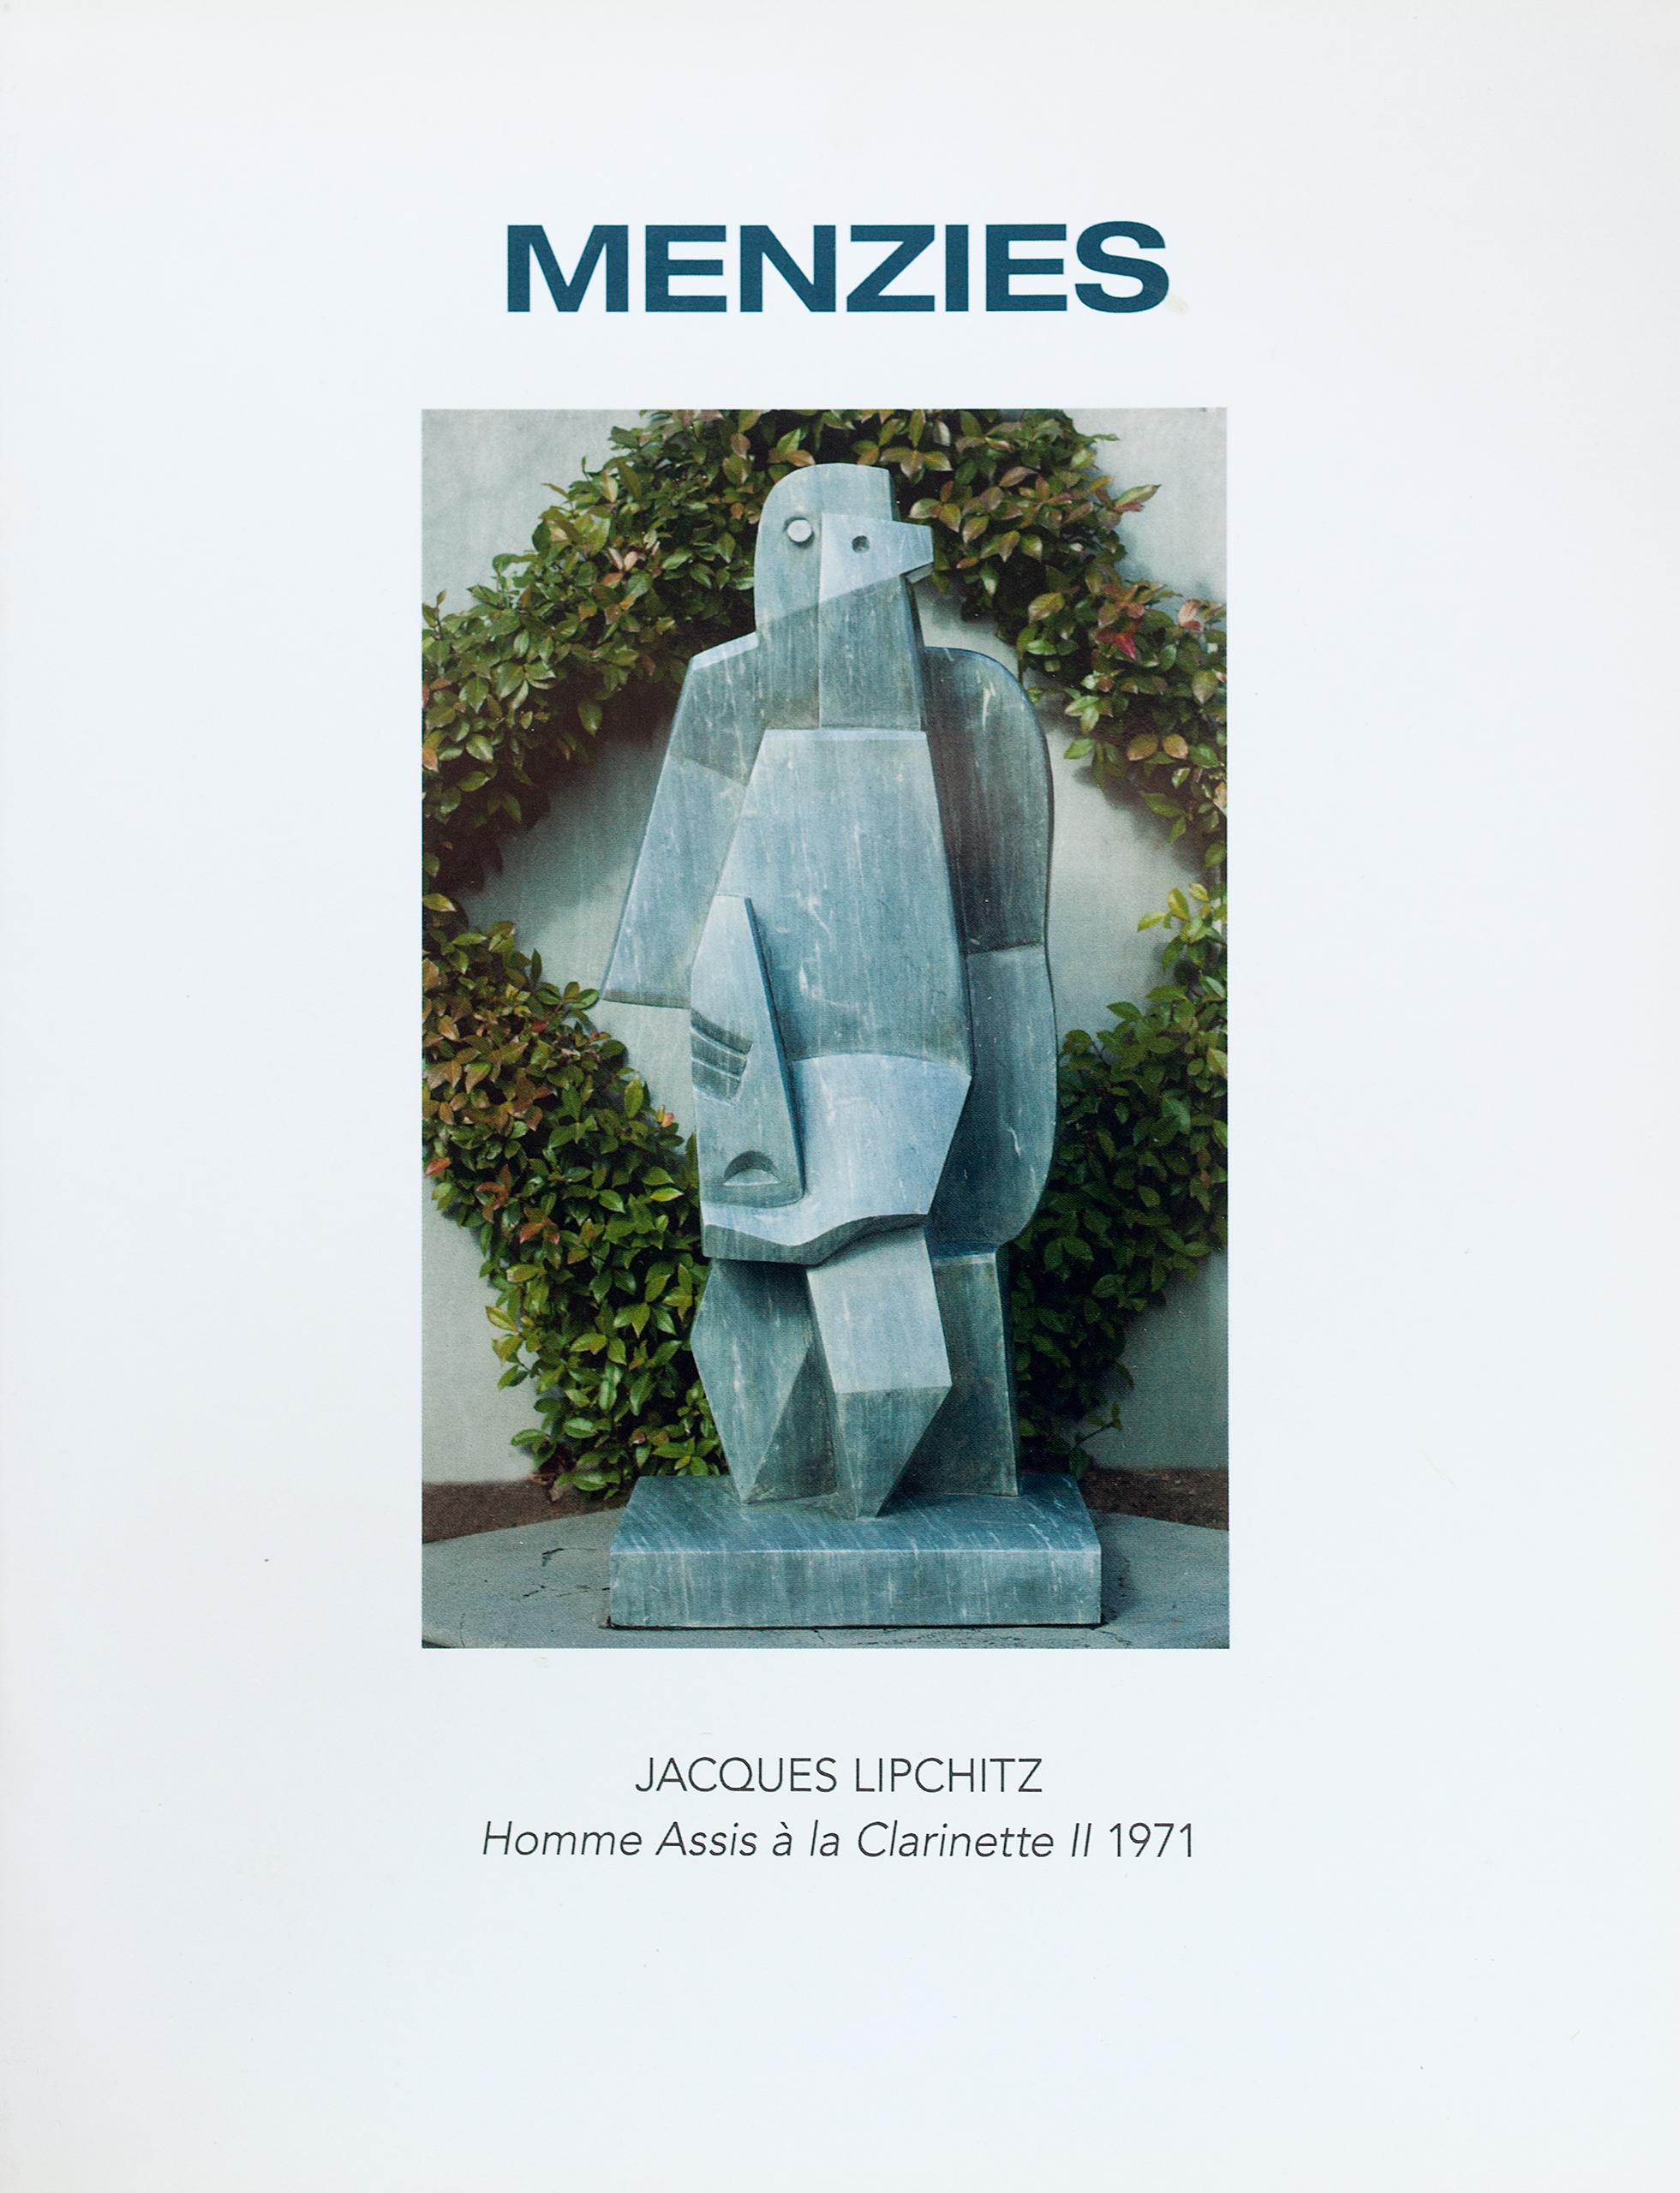 171023 Menzies Catalogues_014.jpg